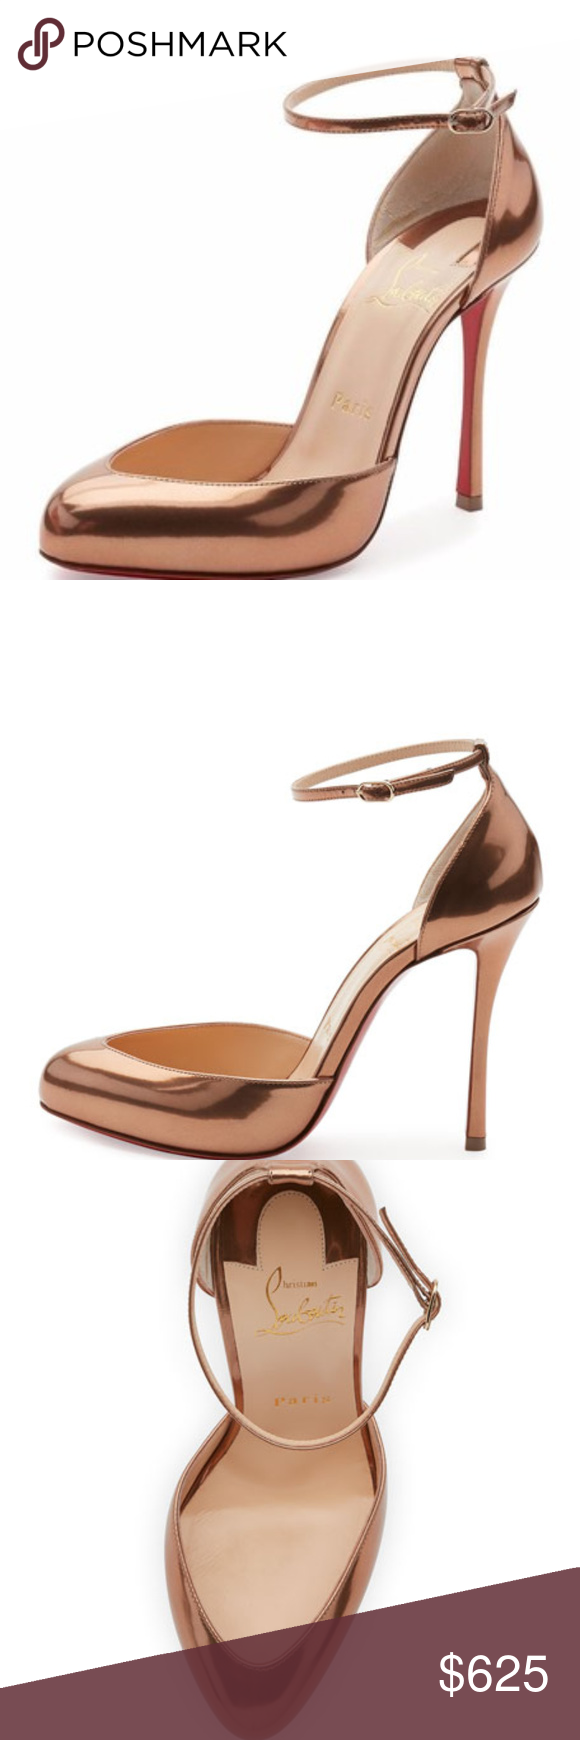 8a3c8ff52885 Christian Louboutin Dollyla 100 Bronze heels Authentic Christian Louboutin Dollyla  100 Bronze Cappuccino Ankle Strap Heel